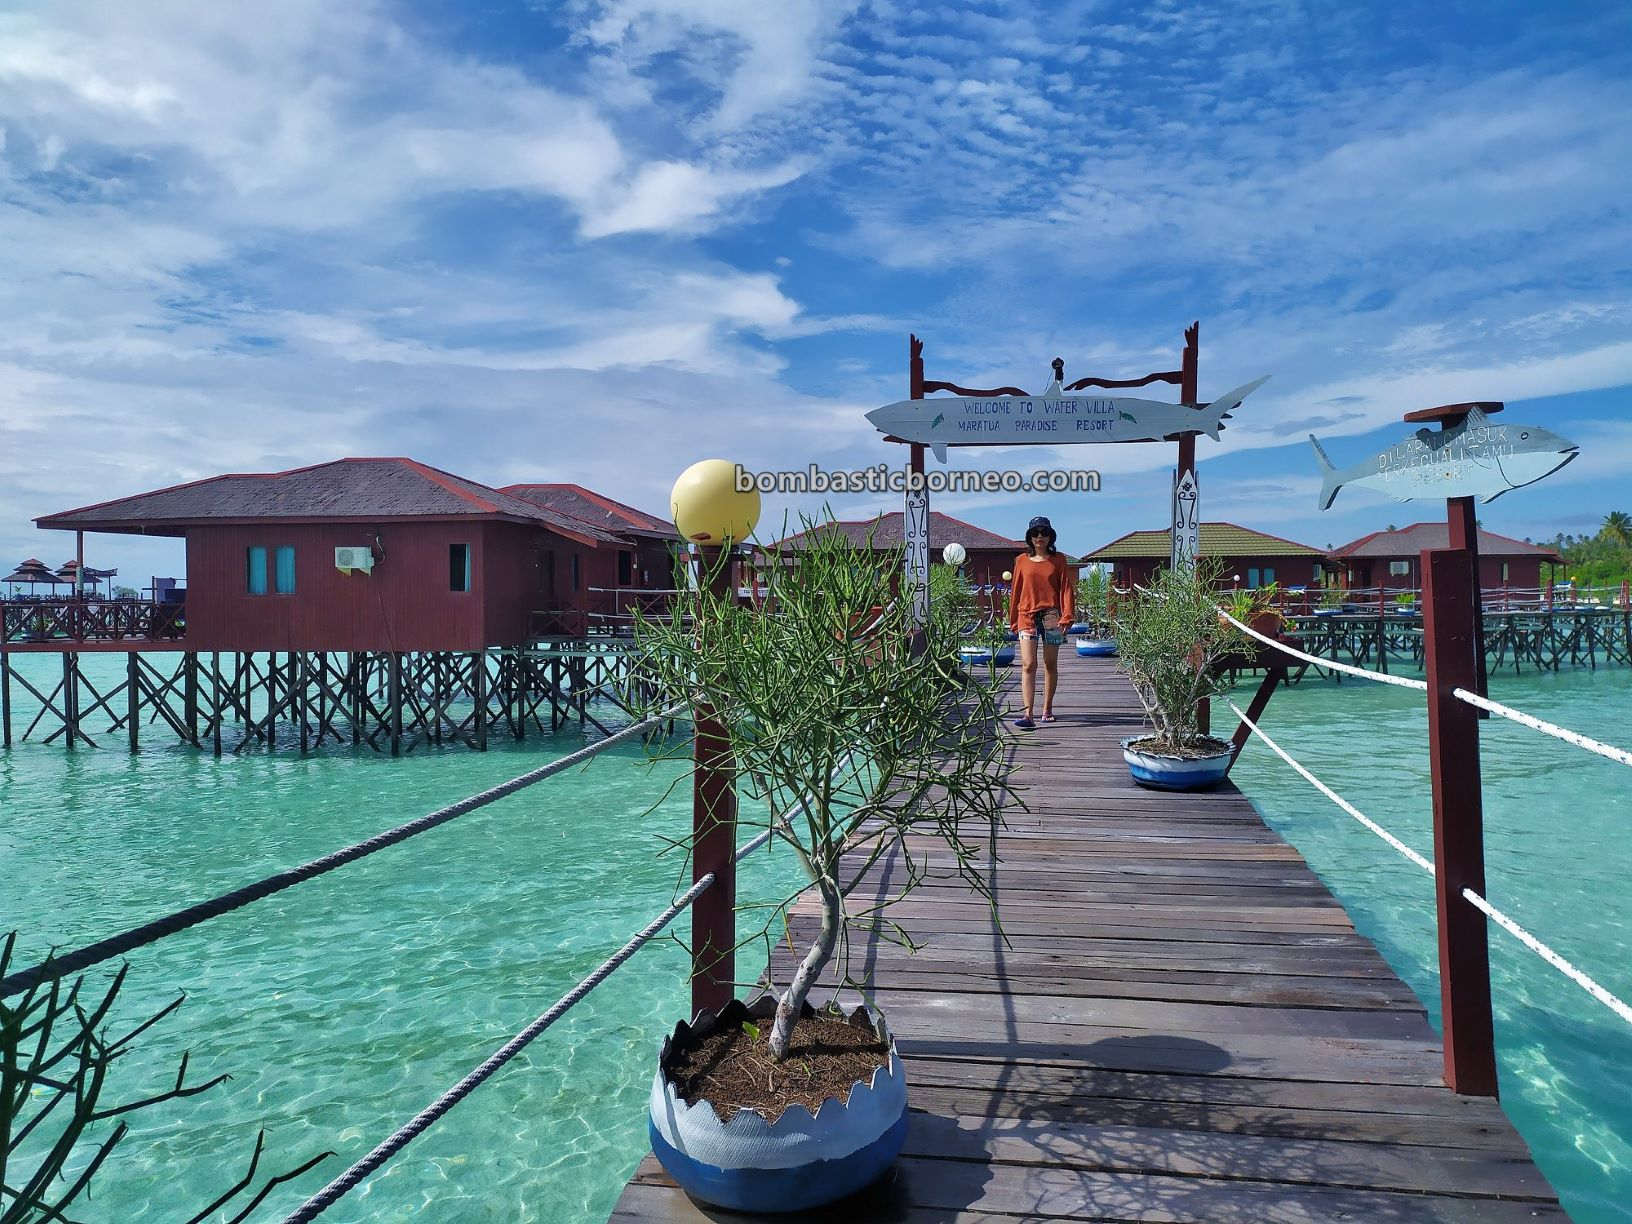 Derawan Archipelago, Maratua Paradise Resort, Destination, diving spot, snorkelling, nature, holiday, vacation, Berau, Kalimantan Timur, Indonesia, wisata alam, tourist attraction, travel guide, Borneo